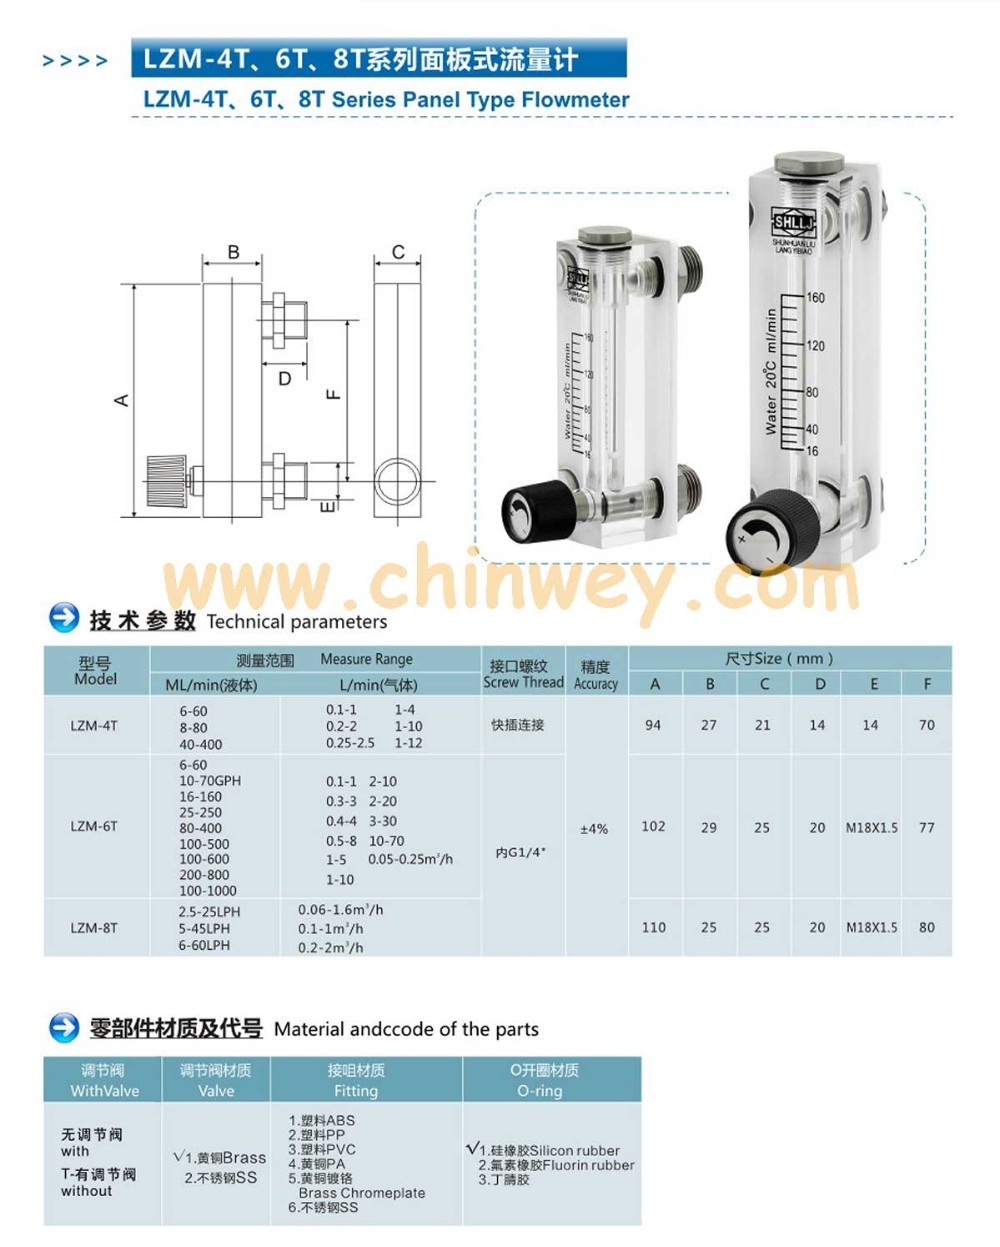 Lzm 6t 05 3lpm 1 6scfh Panel Acrylic Type Flowmeterflow Meter 2006 Honda Cbr600rr Behind Left Middle Fairing Fuse Box Diagram